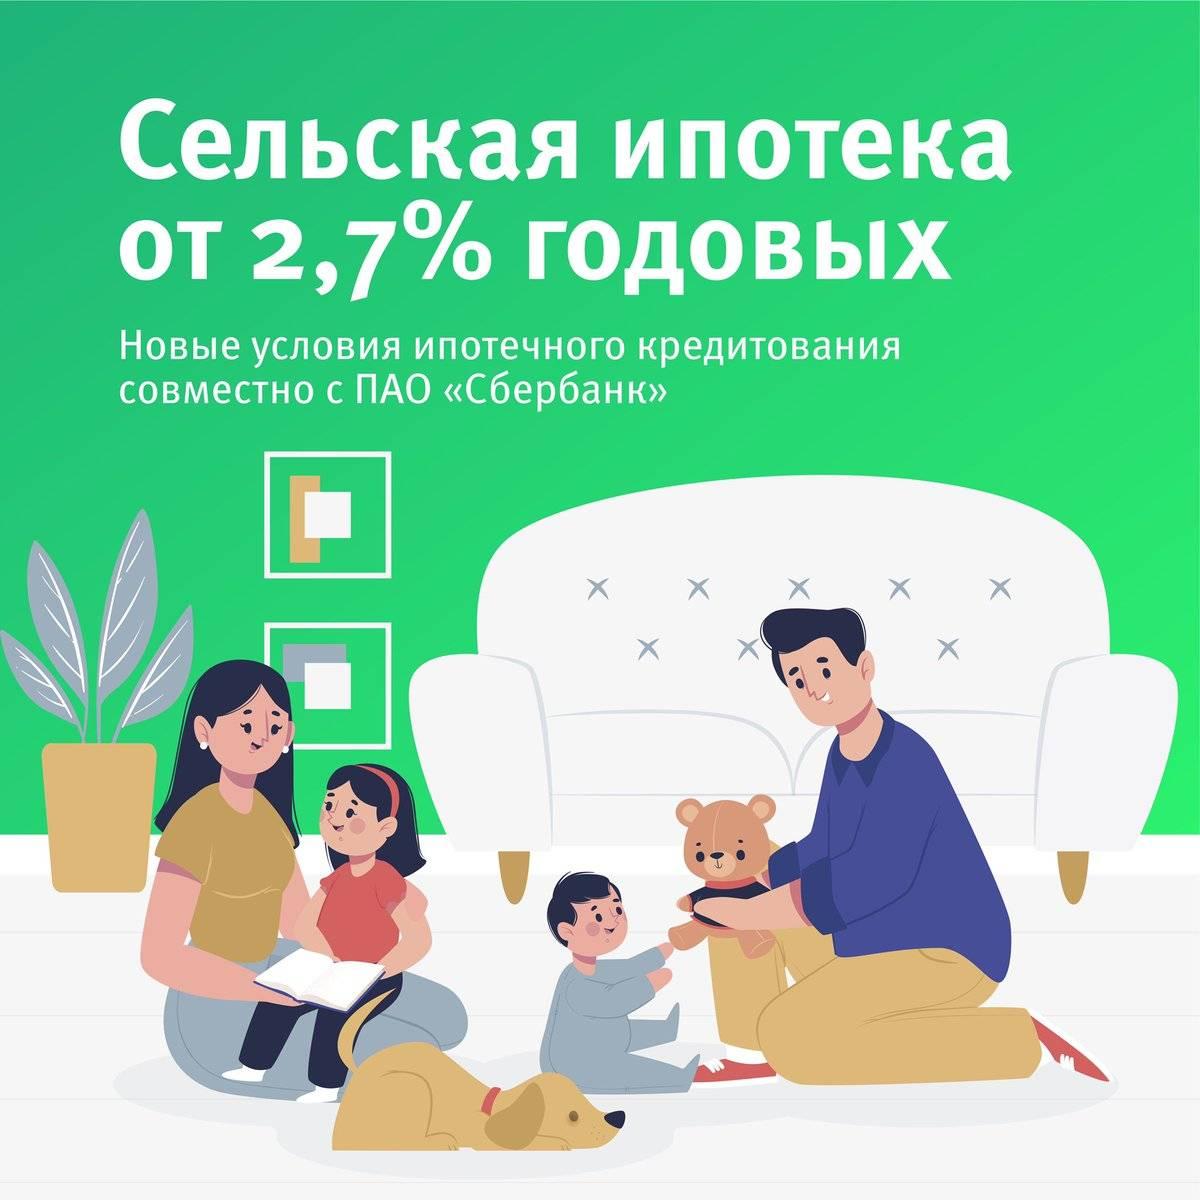 Ипотека в сша: условия, ставка, обзор системы кредитования